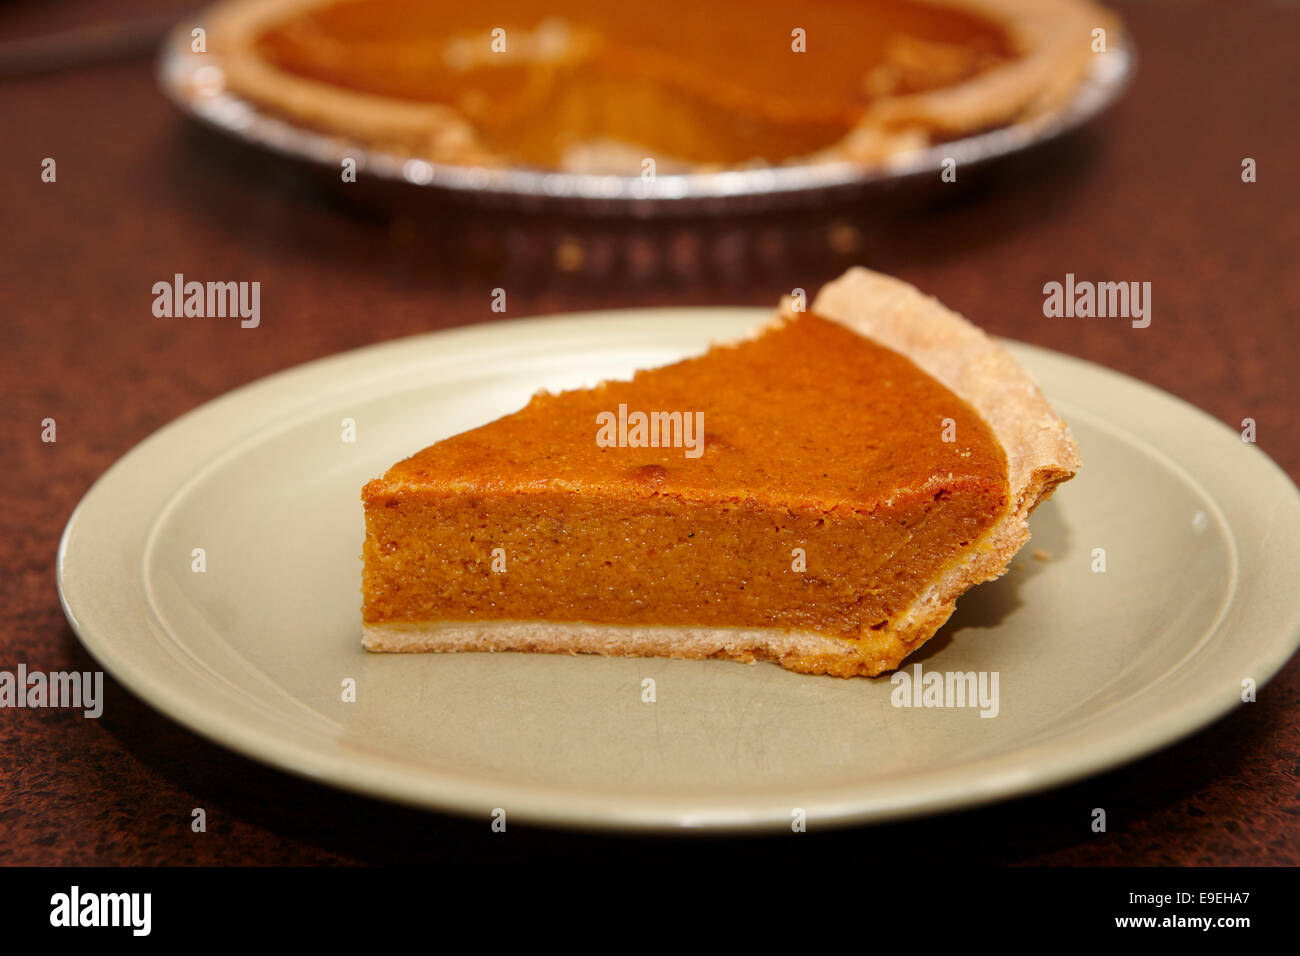 slice of mass produced pumpkin pie - Stock Image